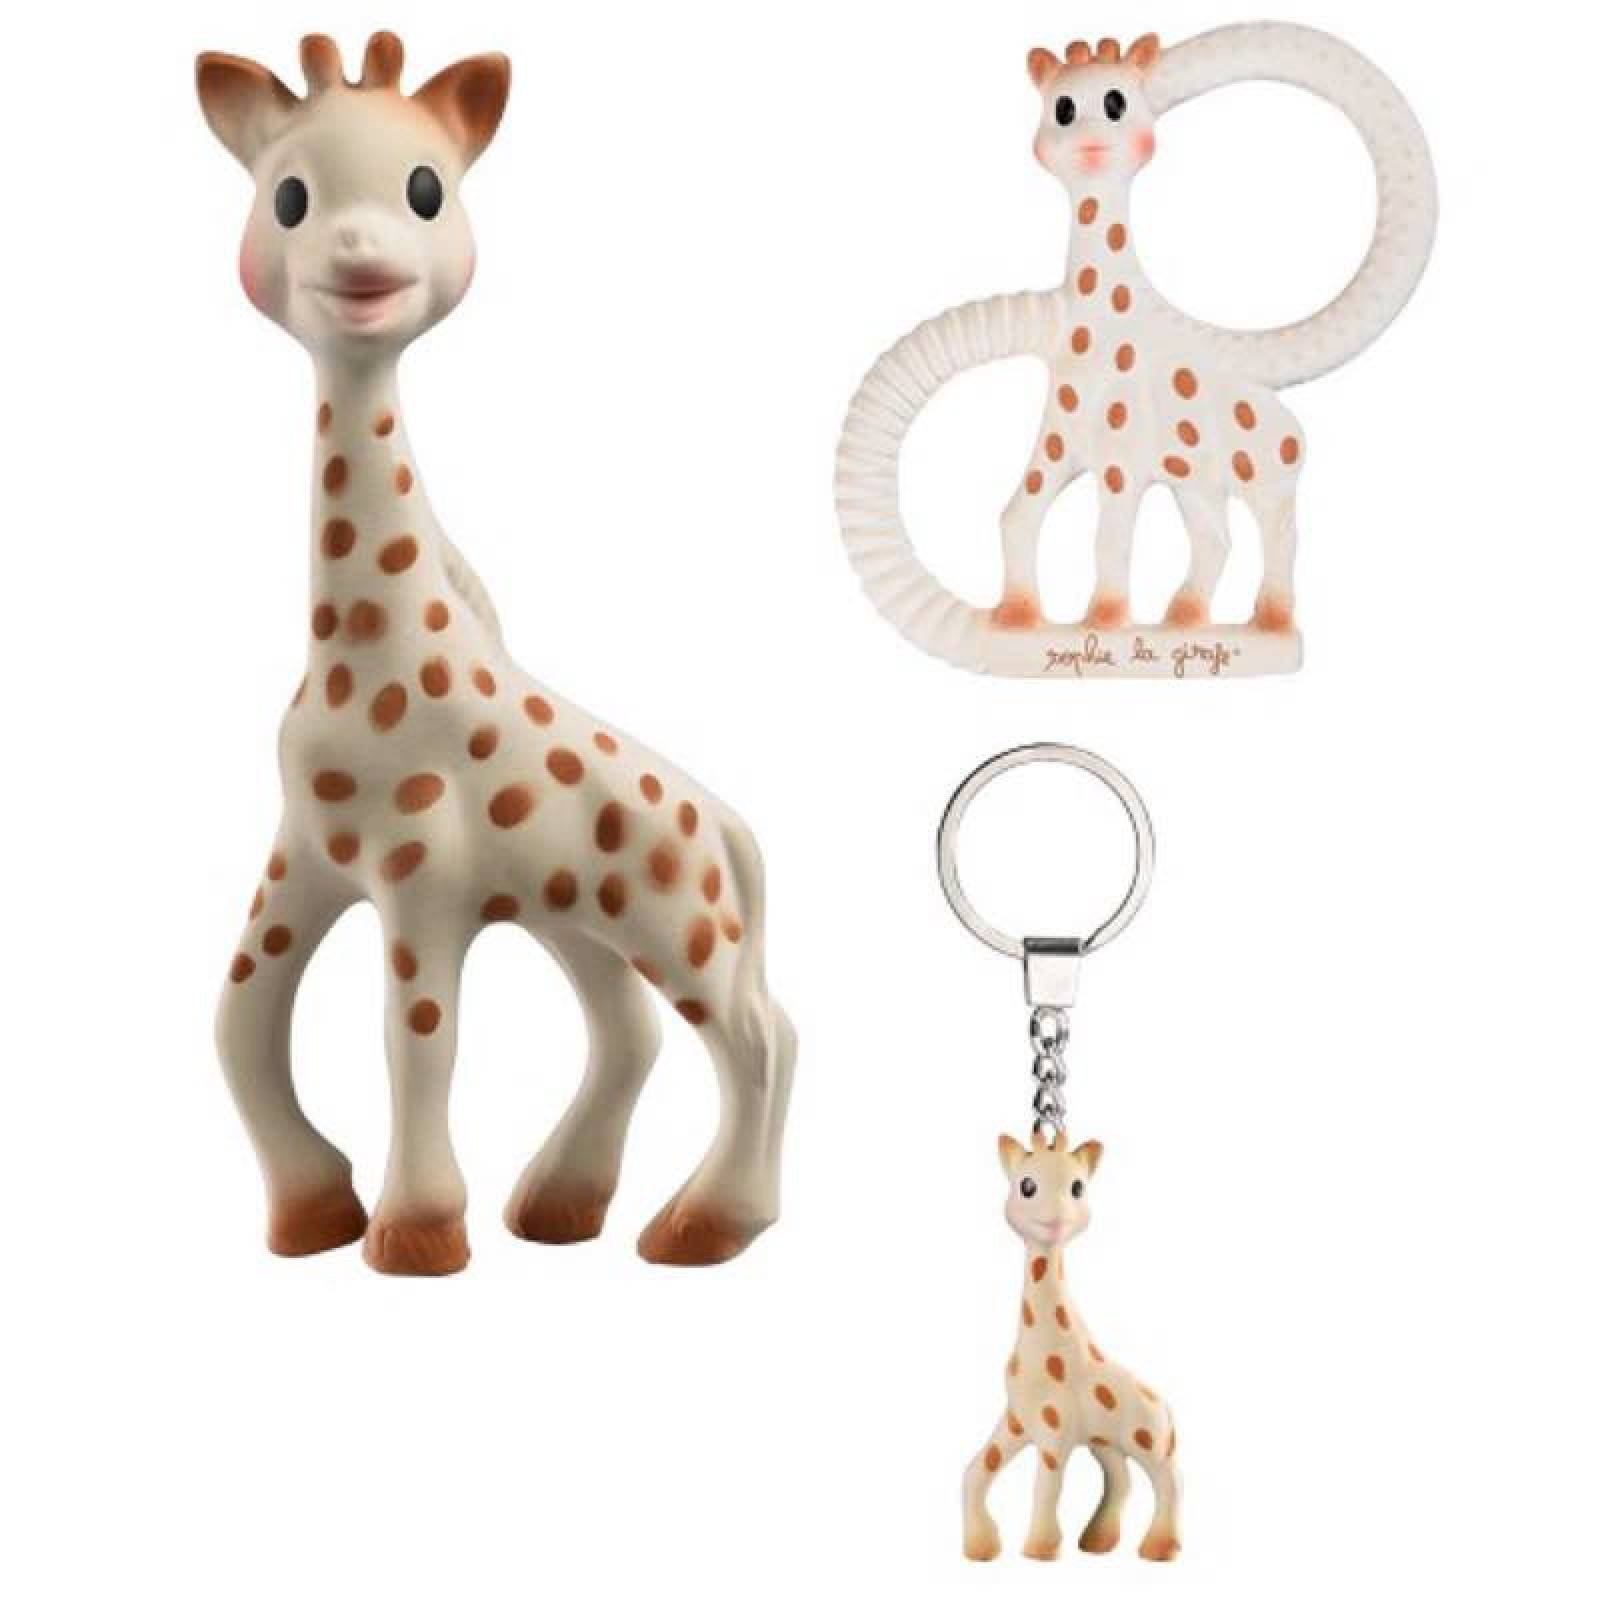 Sophie La Girafe/ The Giraffe Trio Boxed Gift Set thumbnails